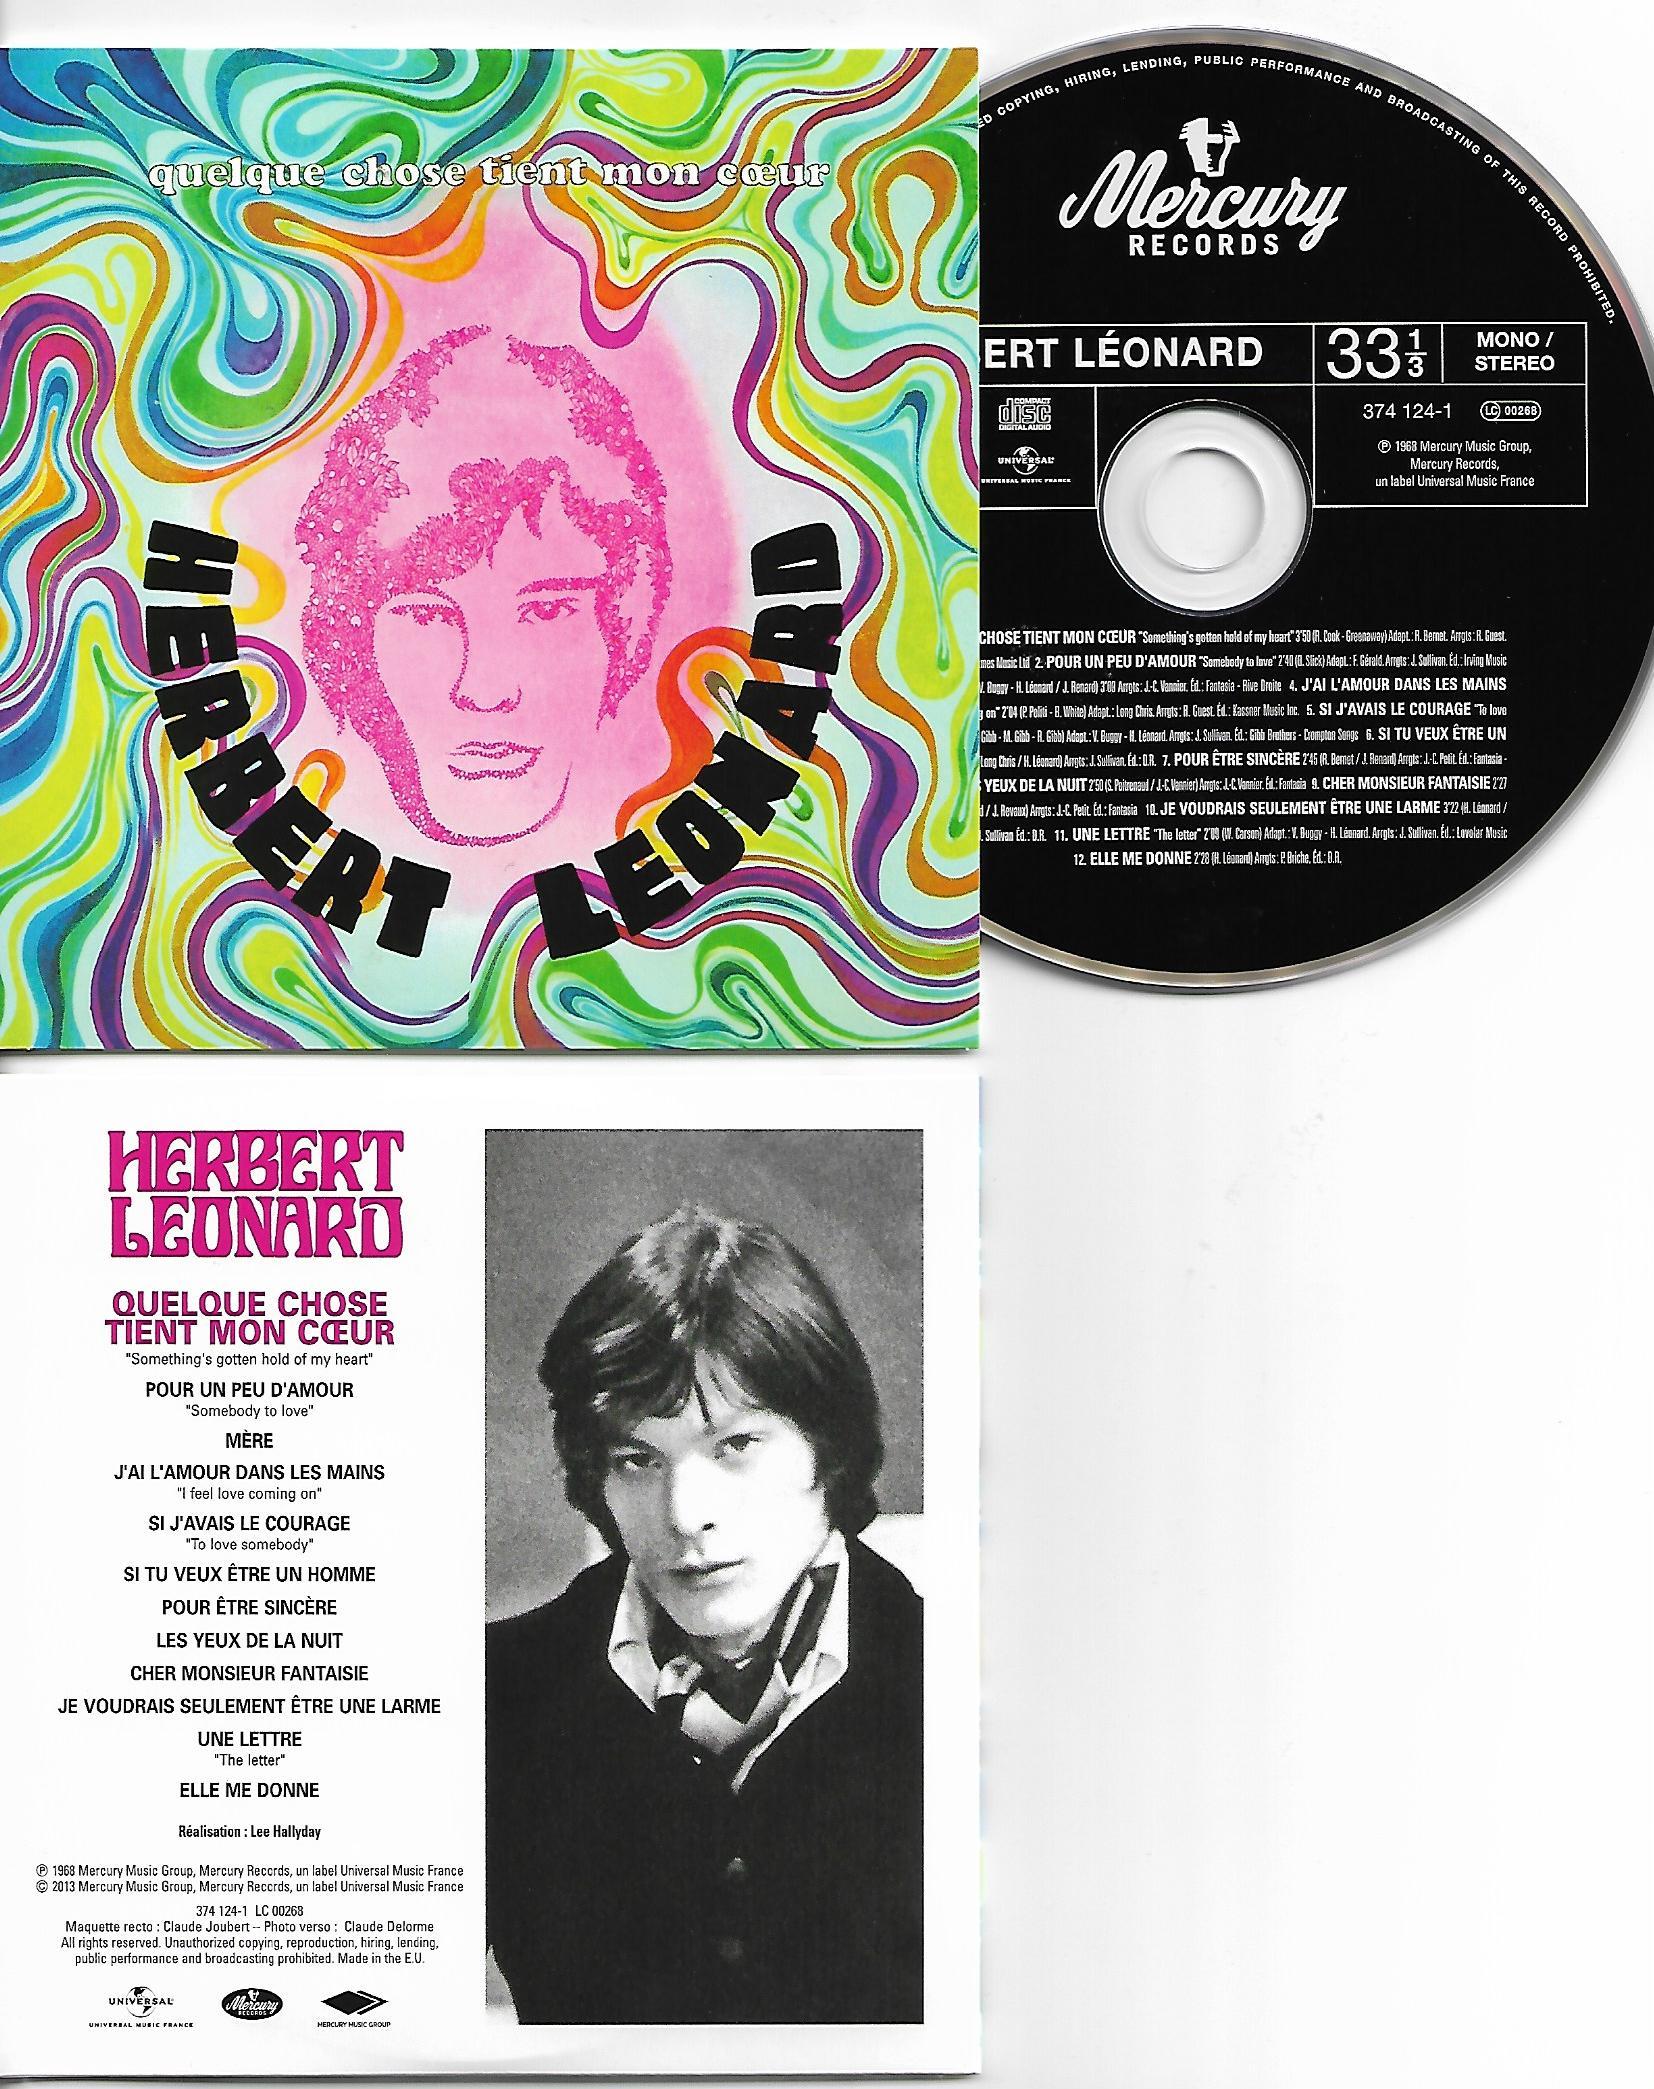 HERBERT LÉONARD - Quelque chose tient mon coeur - MINI LP REPLICA CARD SLEEVE -12 -TRACK - CD